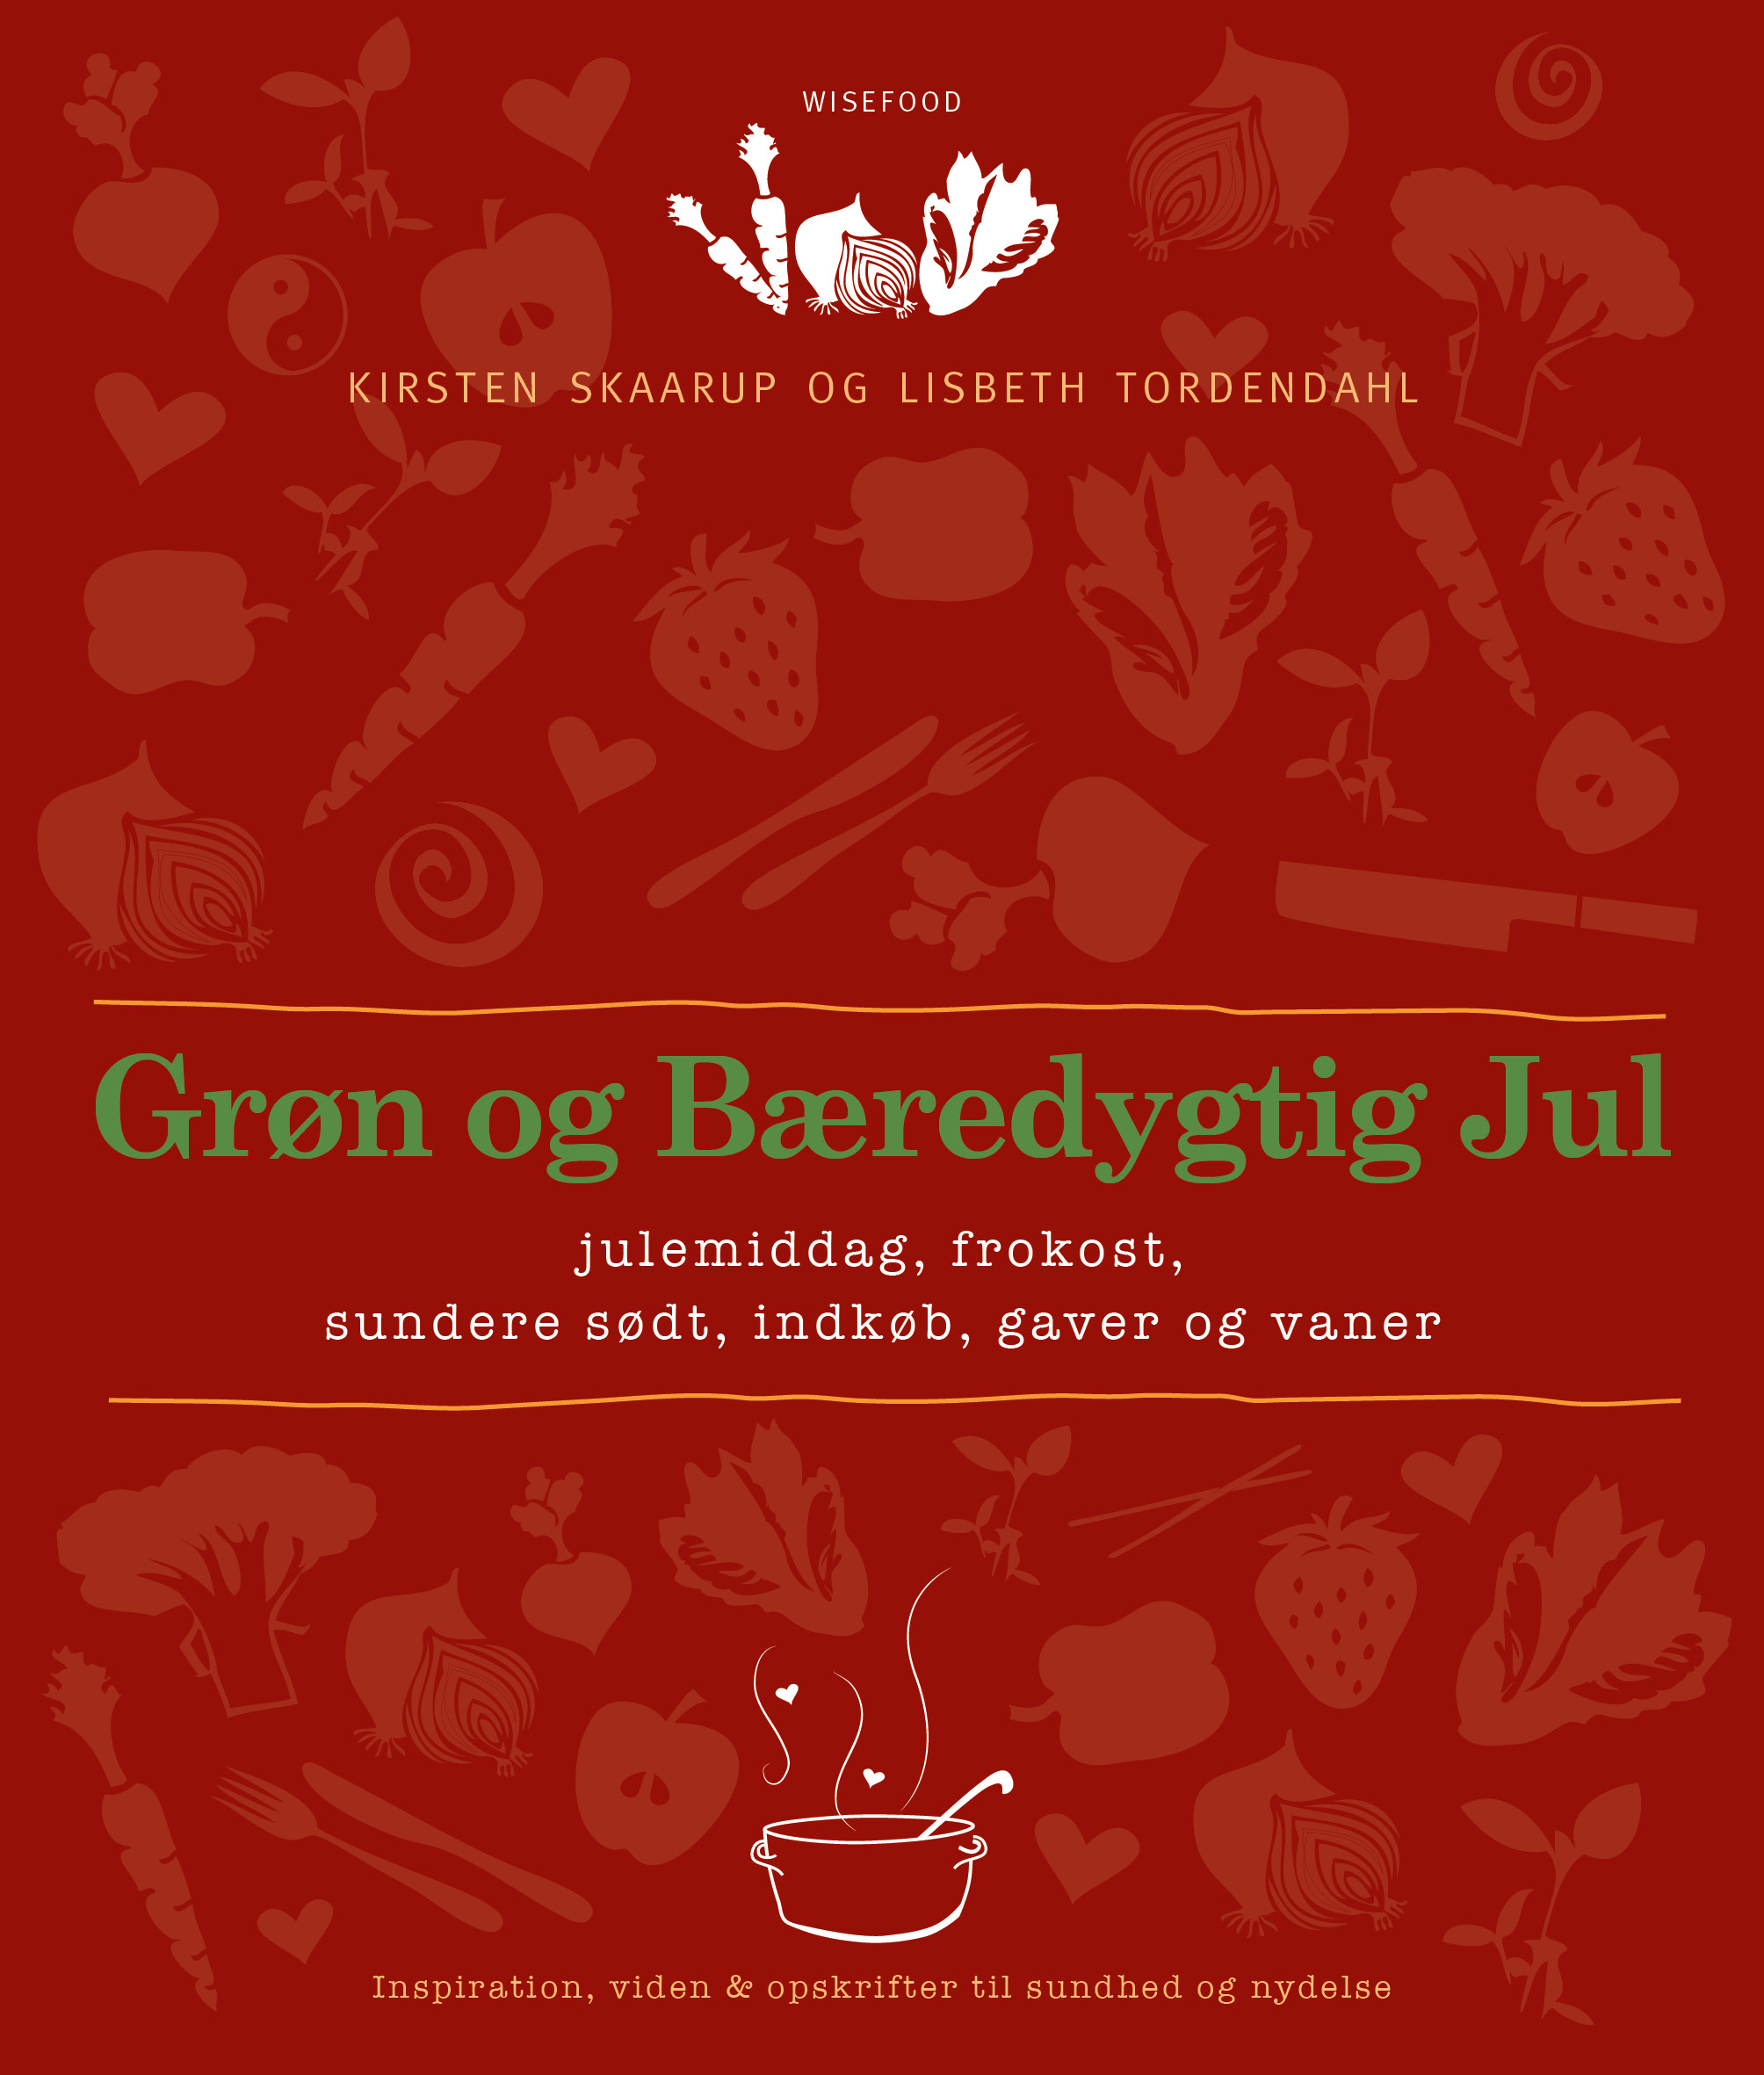 Grøn og bæredygtig jul e-bog gratis